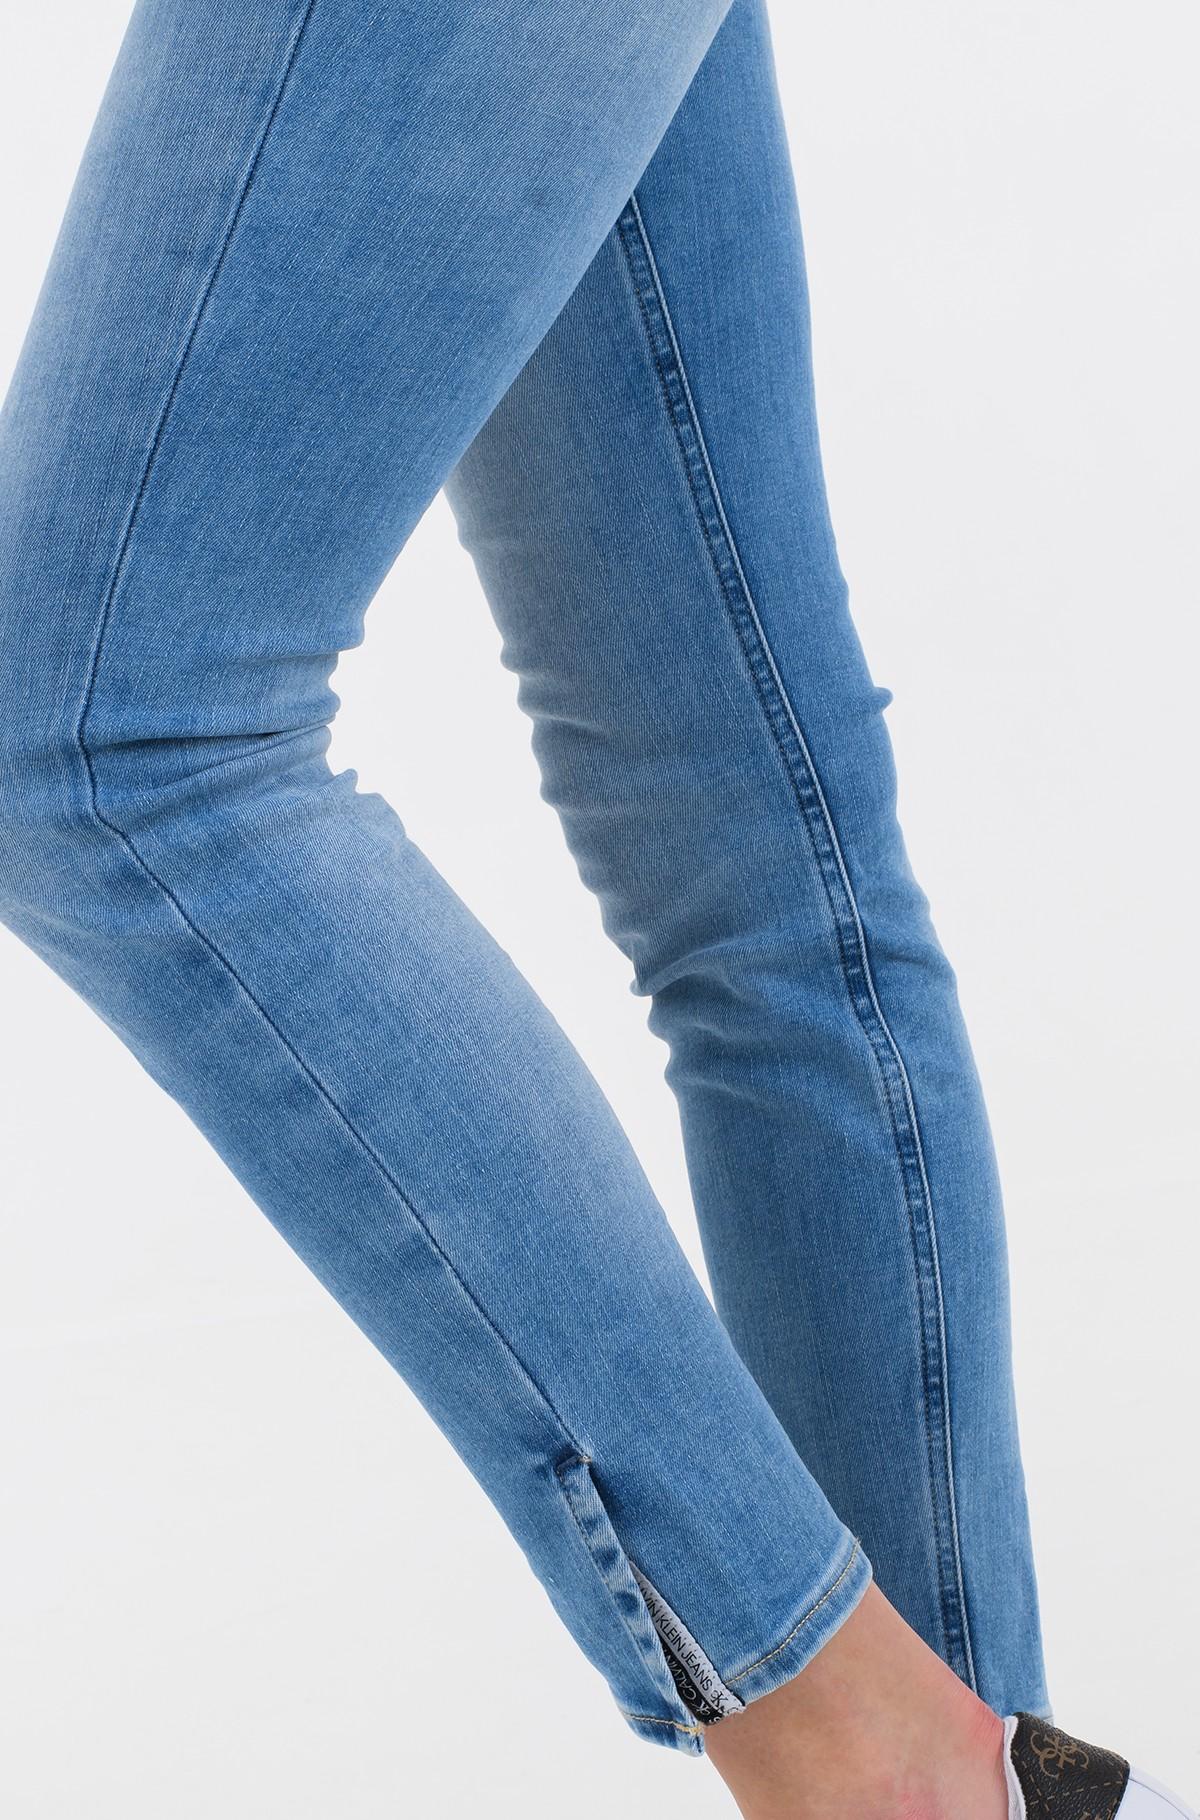 Džinsinės kelnės MID RISE SKINNY ANKLE J20J215401 -full-2